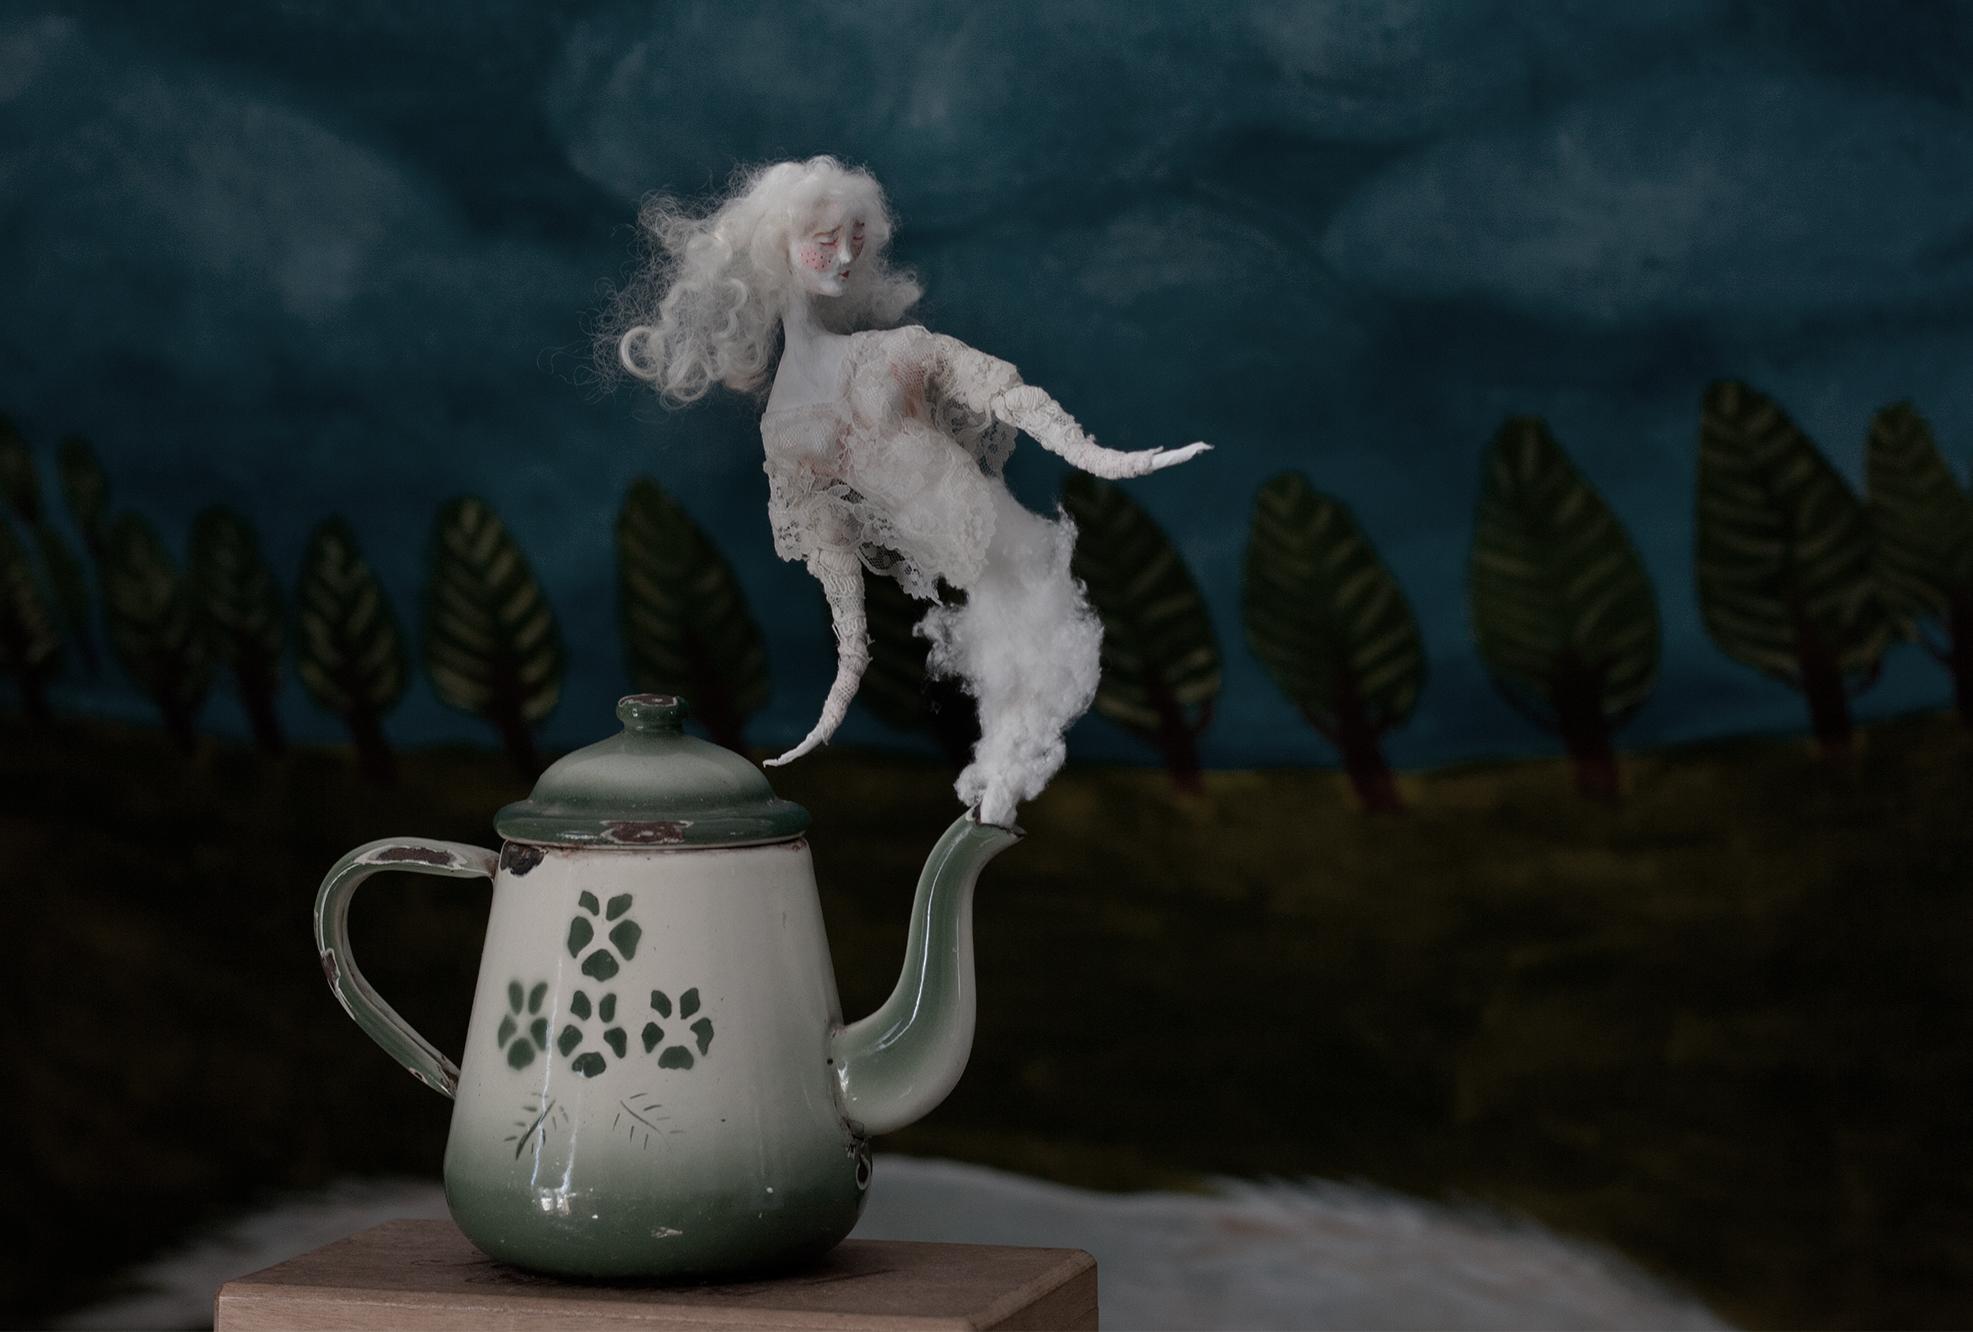 Teapot Ghost